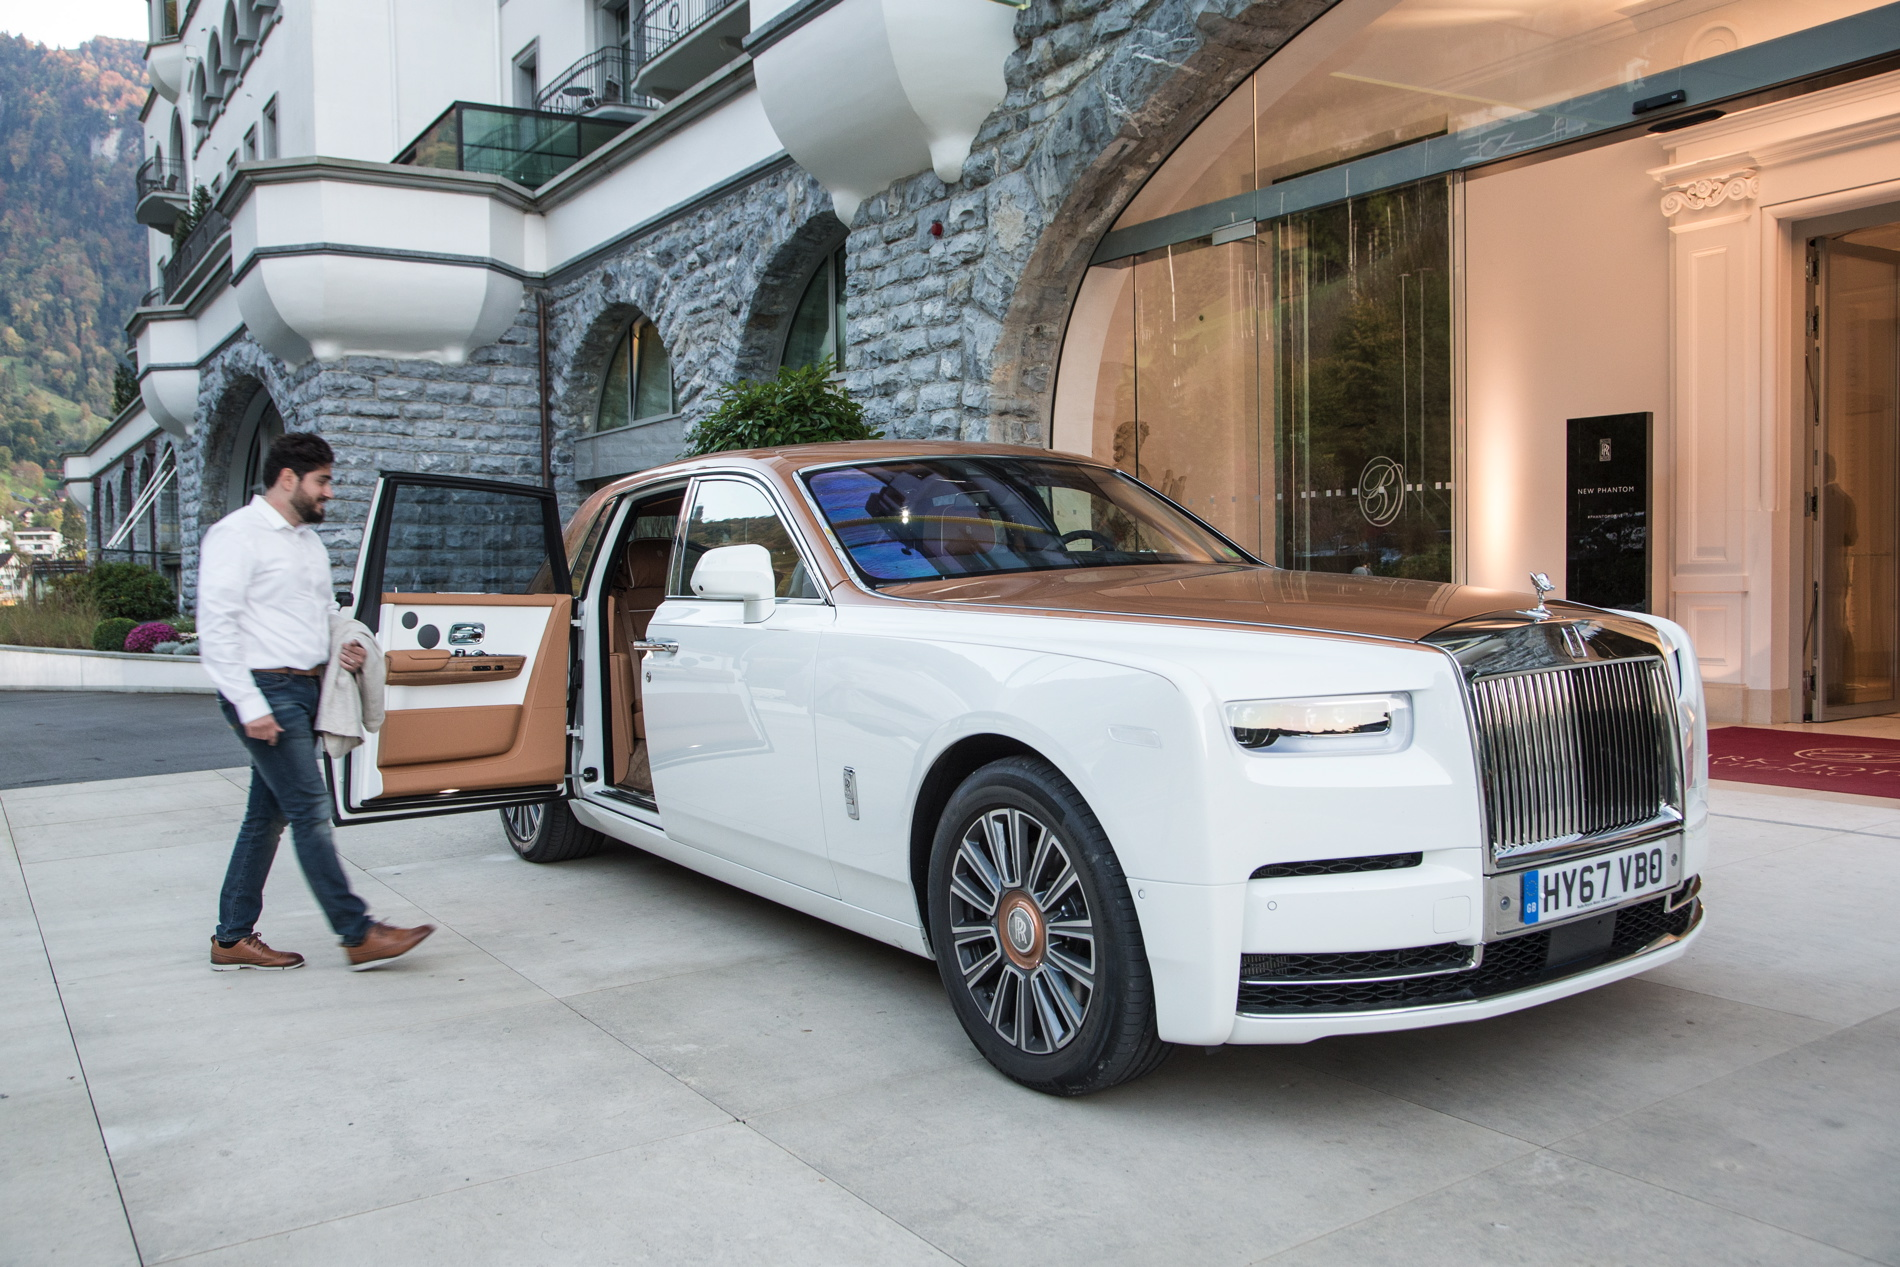 Rolls Royce Phantom Viii Wins Luxury Car Of The Year Award In Uk